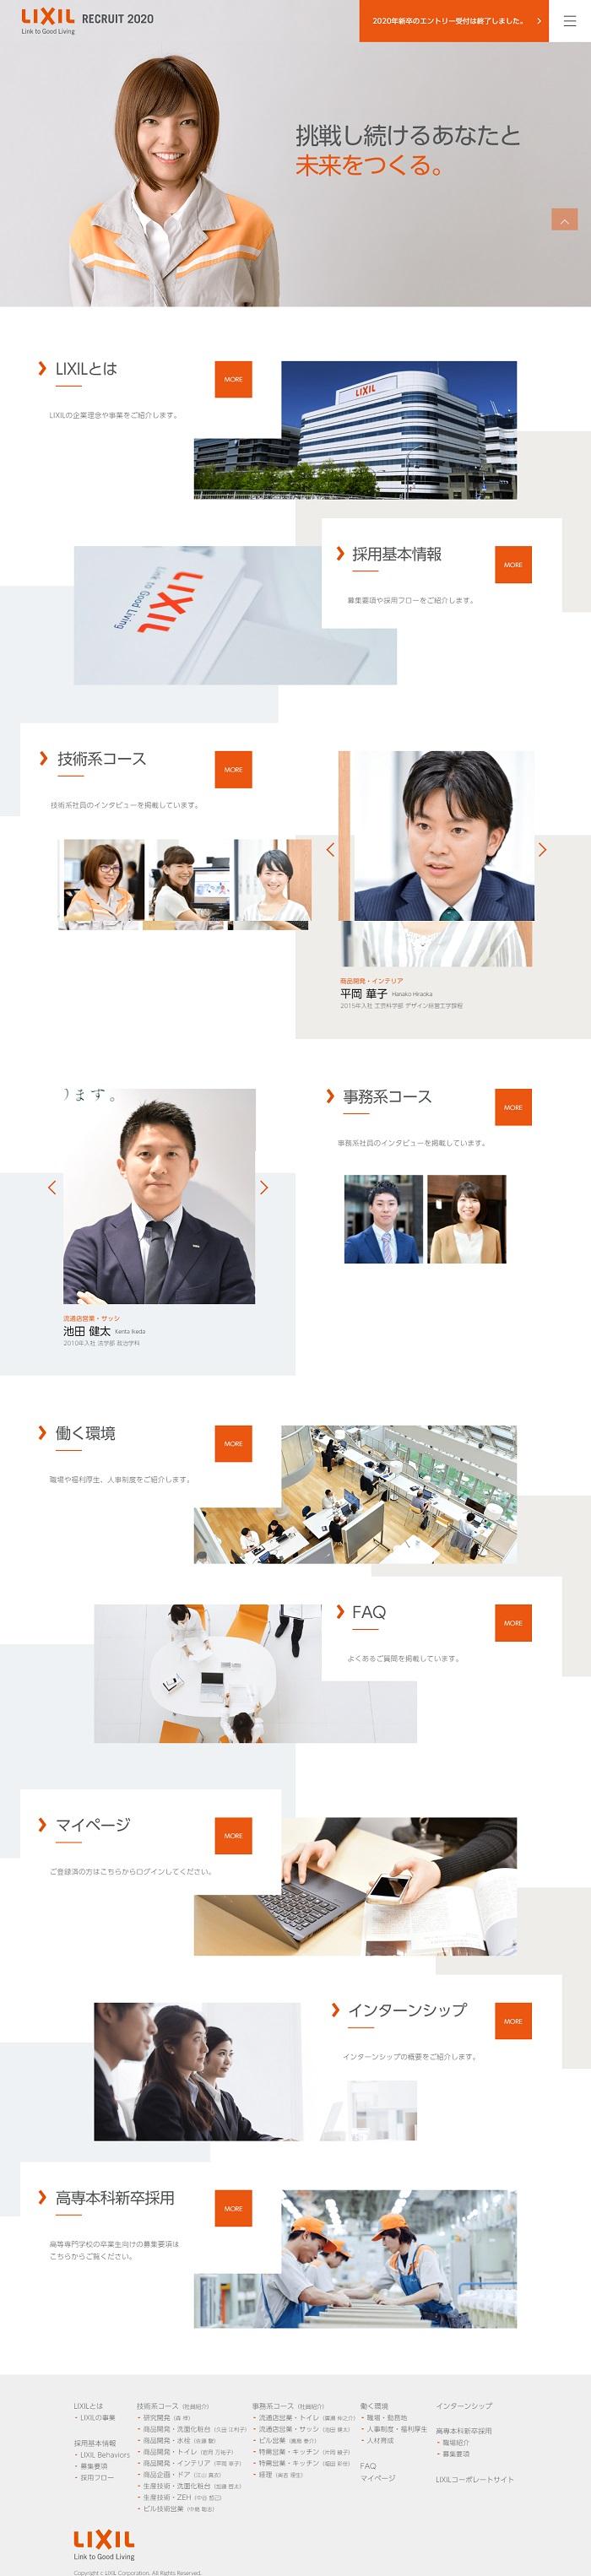 LIXIL新卒採用トップページ